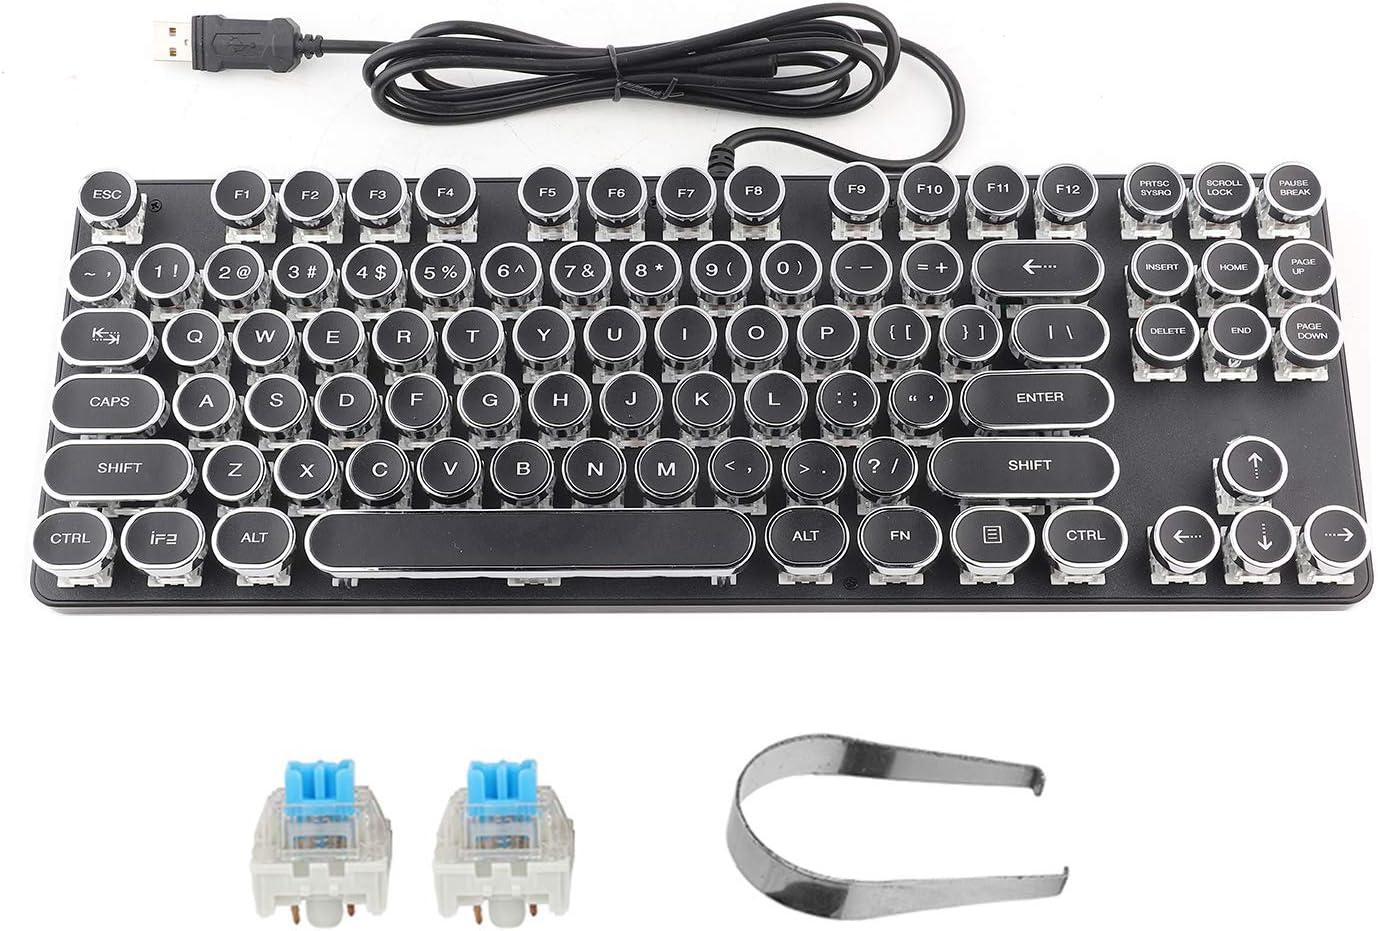 Vbestlife Punk Max 52% OFF Gaming Super sale period limited Wired Compu Mechanical Keyboard